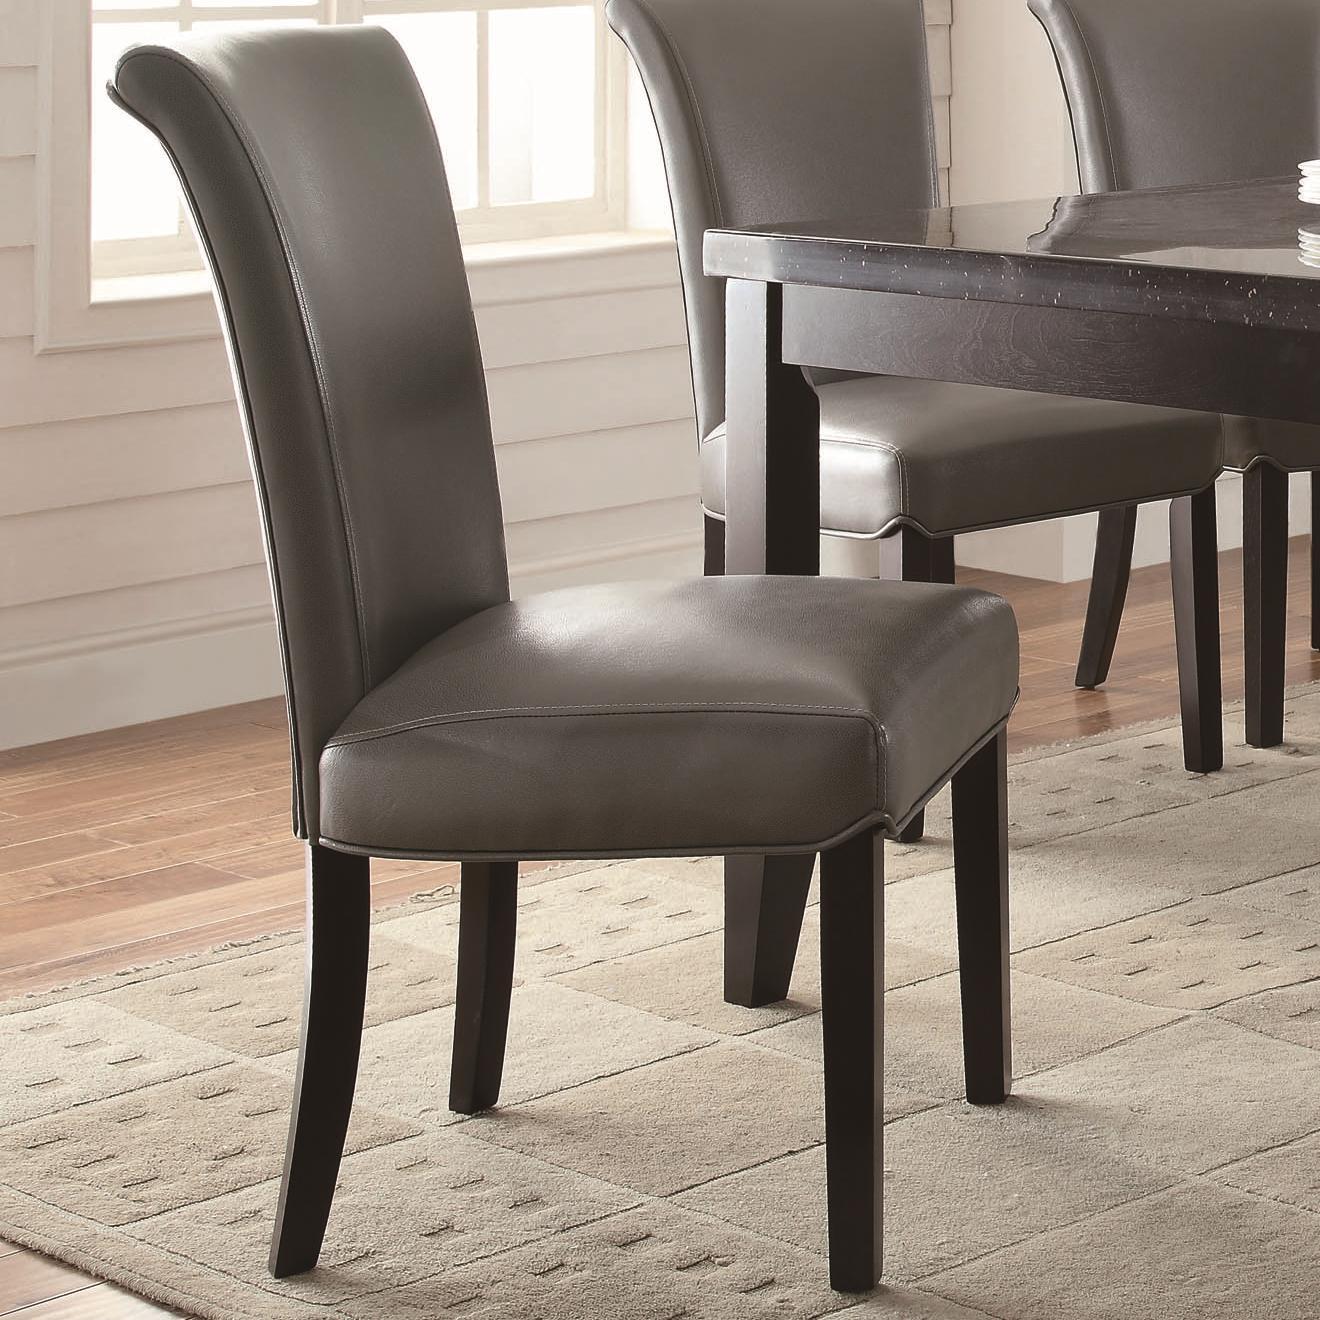 coaster newbridge upholstered metal side chair value city furniture dining side chairs. Black Bedroom Furniture Sets. Home Design Ideas